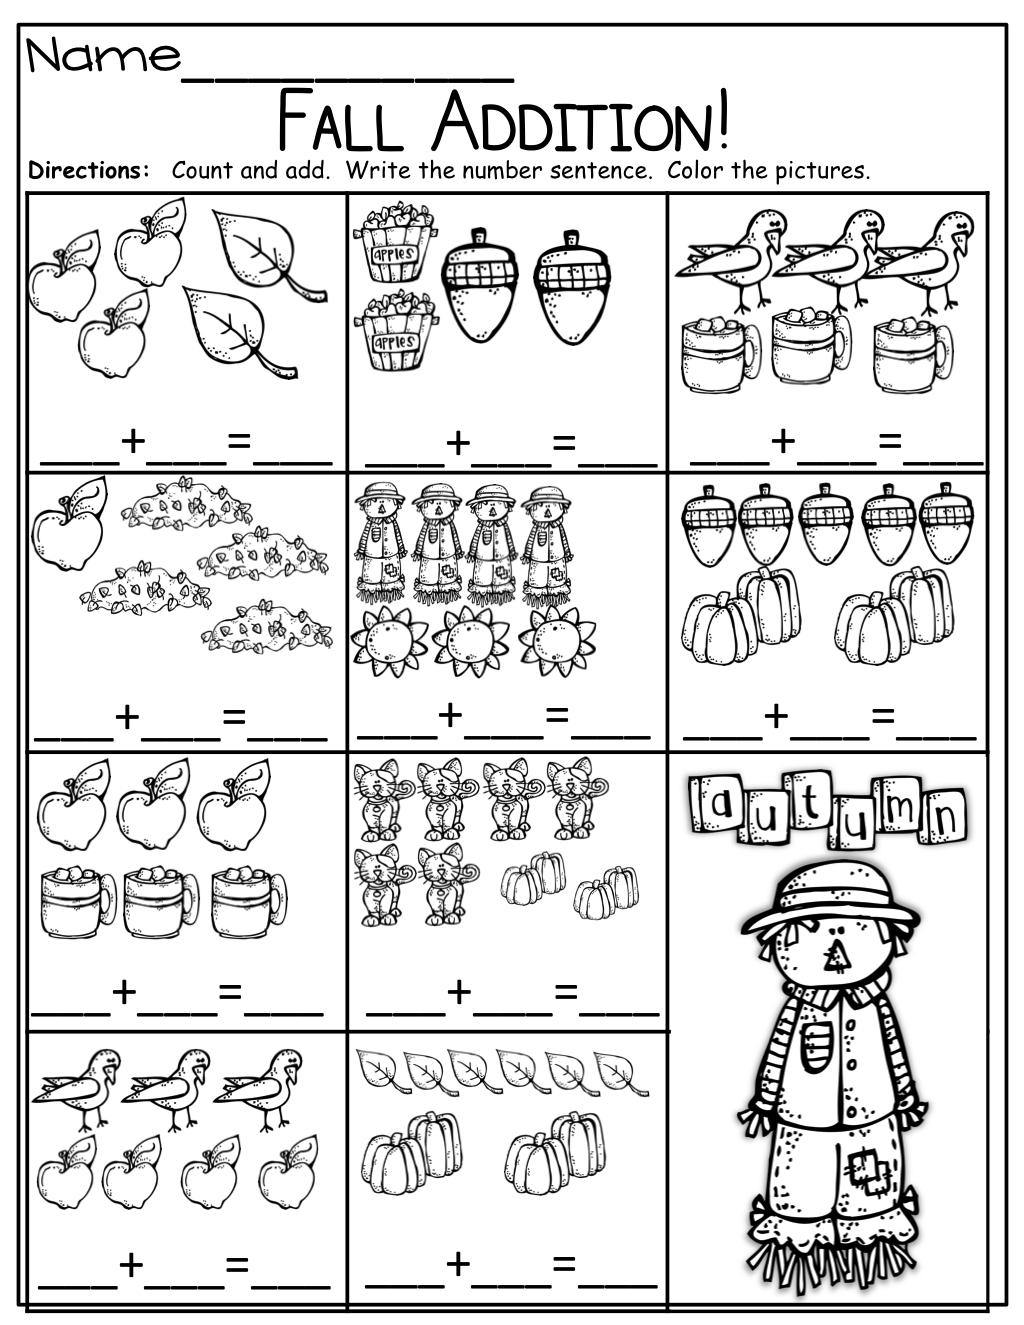 Simple Addition Sentences For Fall! | Mathématiques encequiconcerne Addition Maternelle